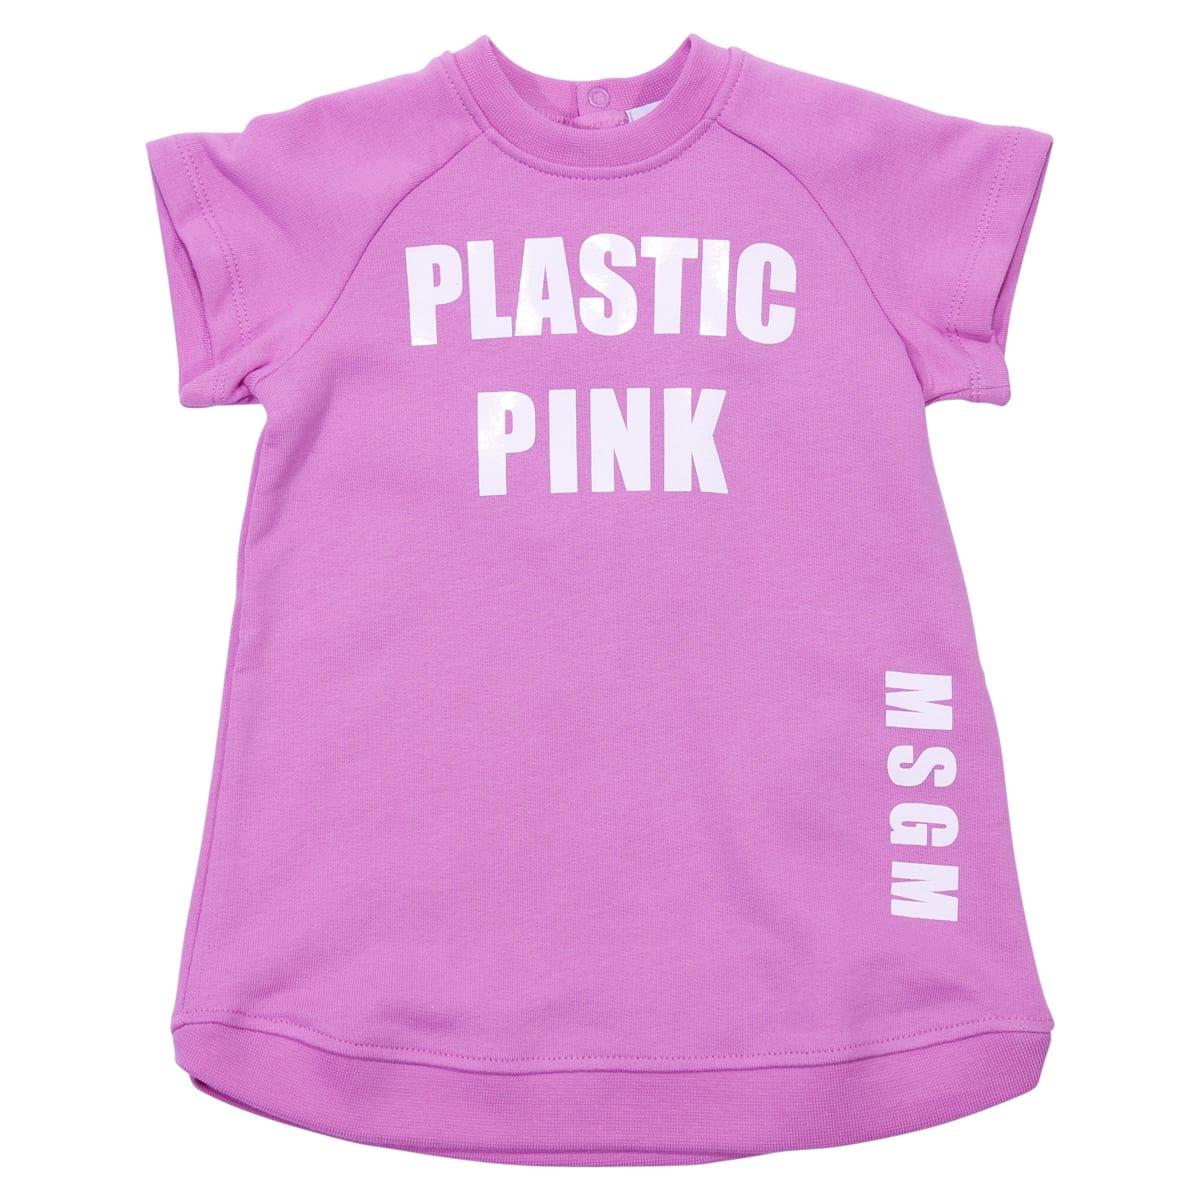 MSGM Pink Cotton Sweatshirt Dress